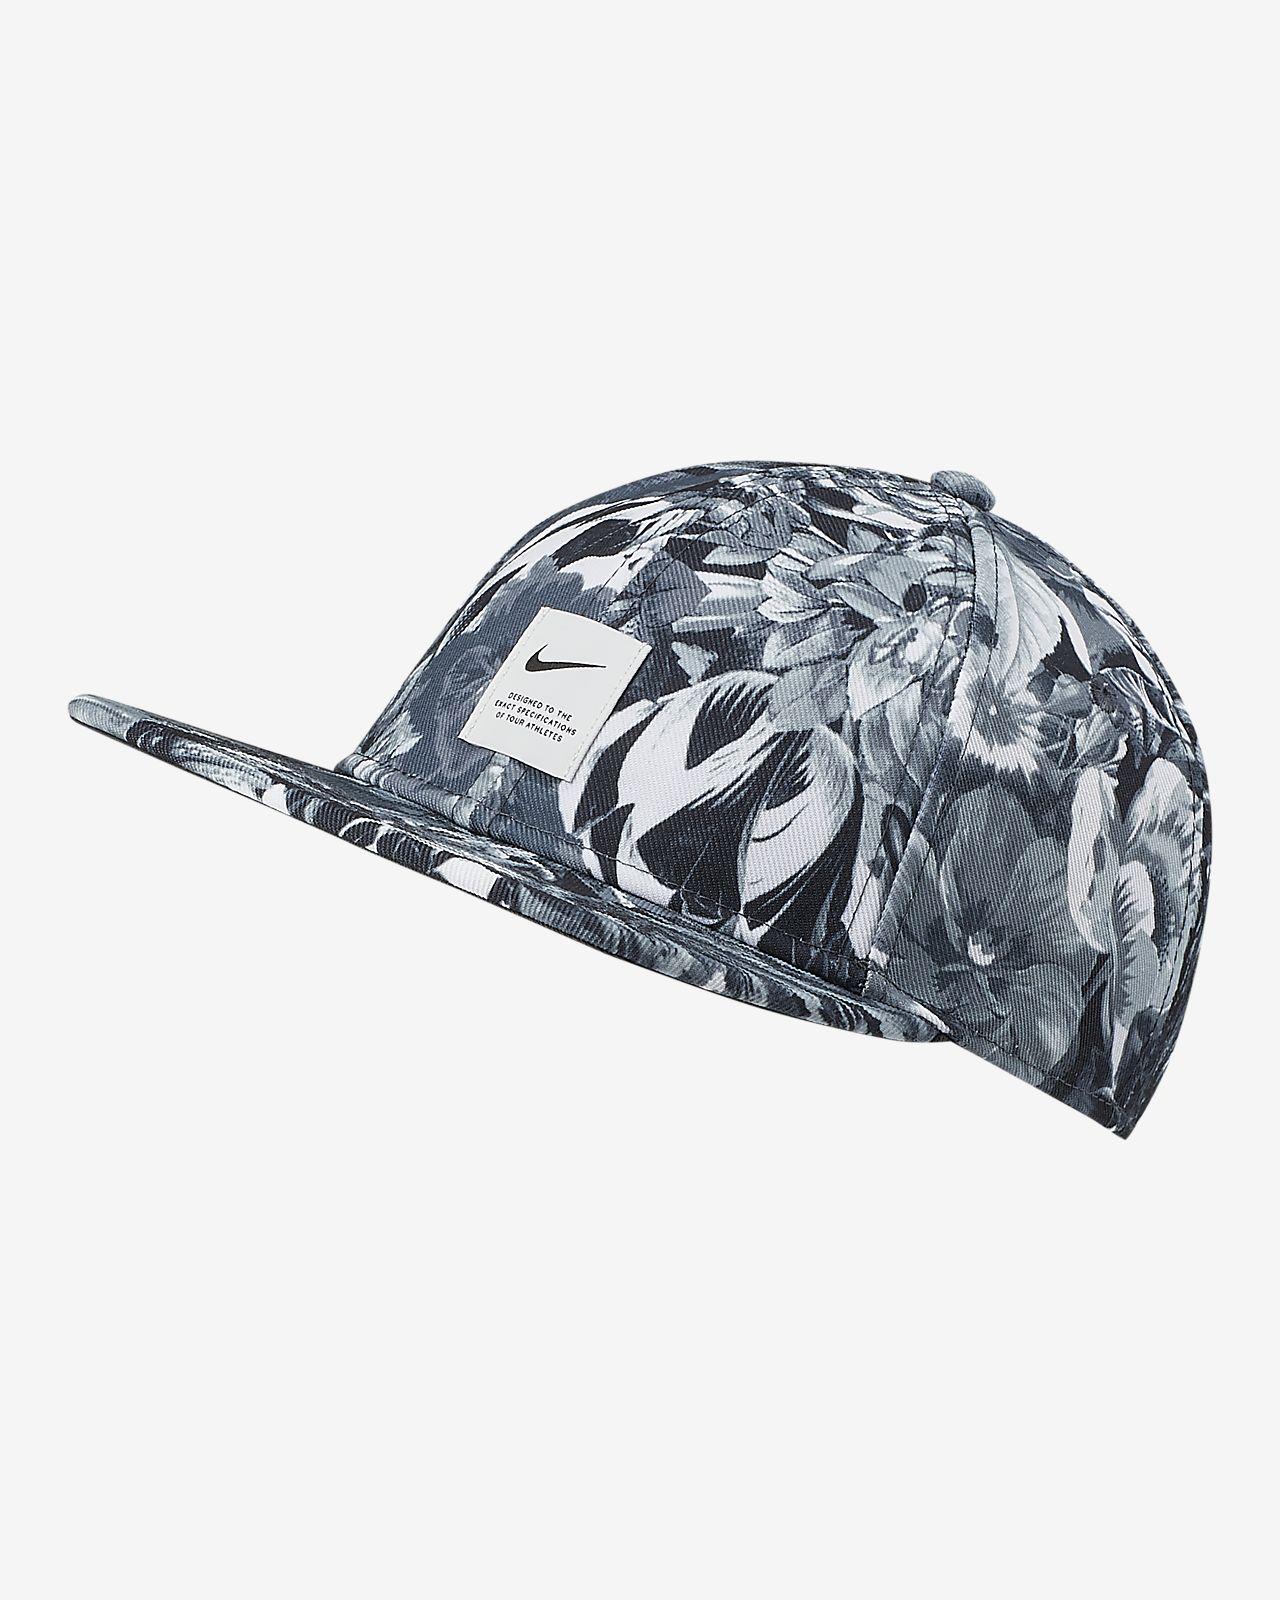 b96890cc06c Nike Heritage86 Women s Printed Golf Hat. (colors version too)